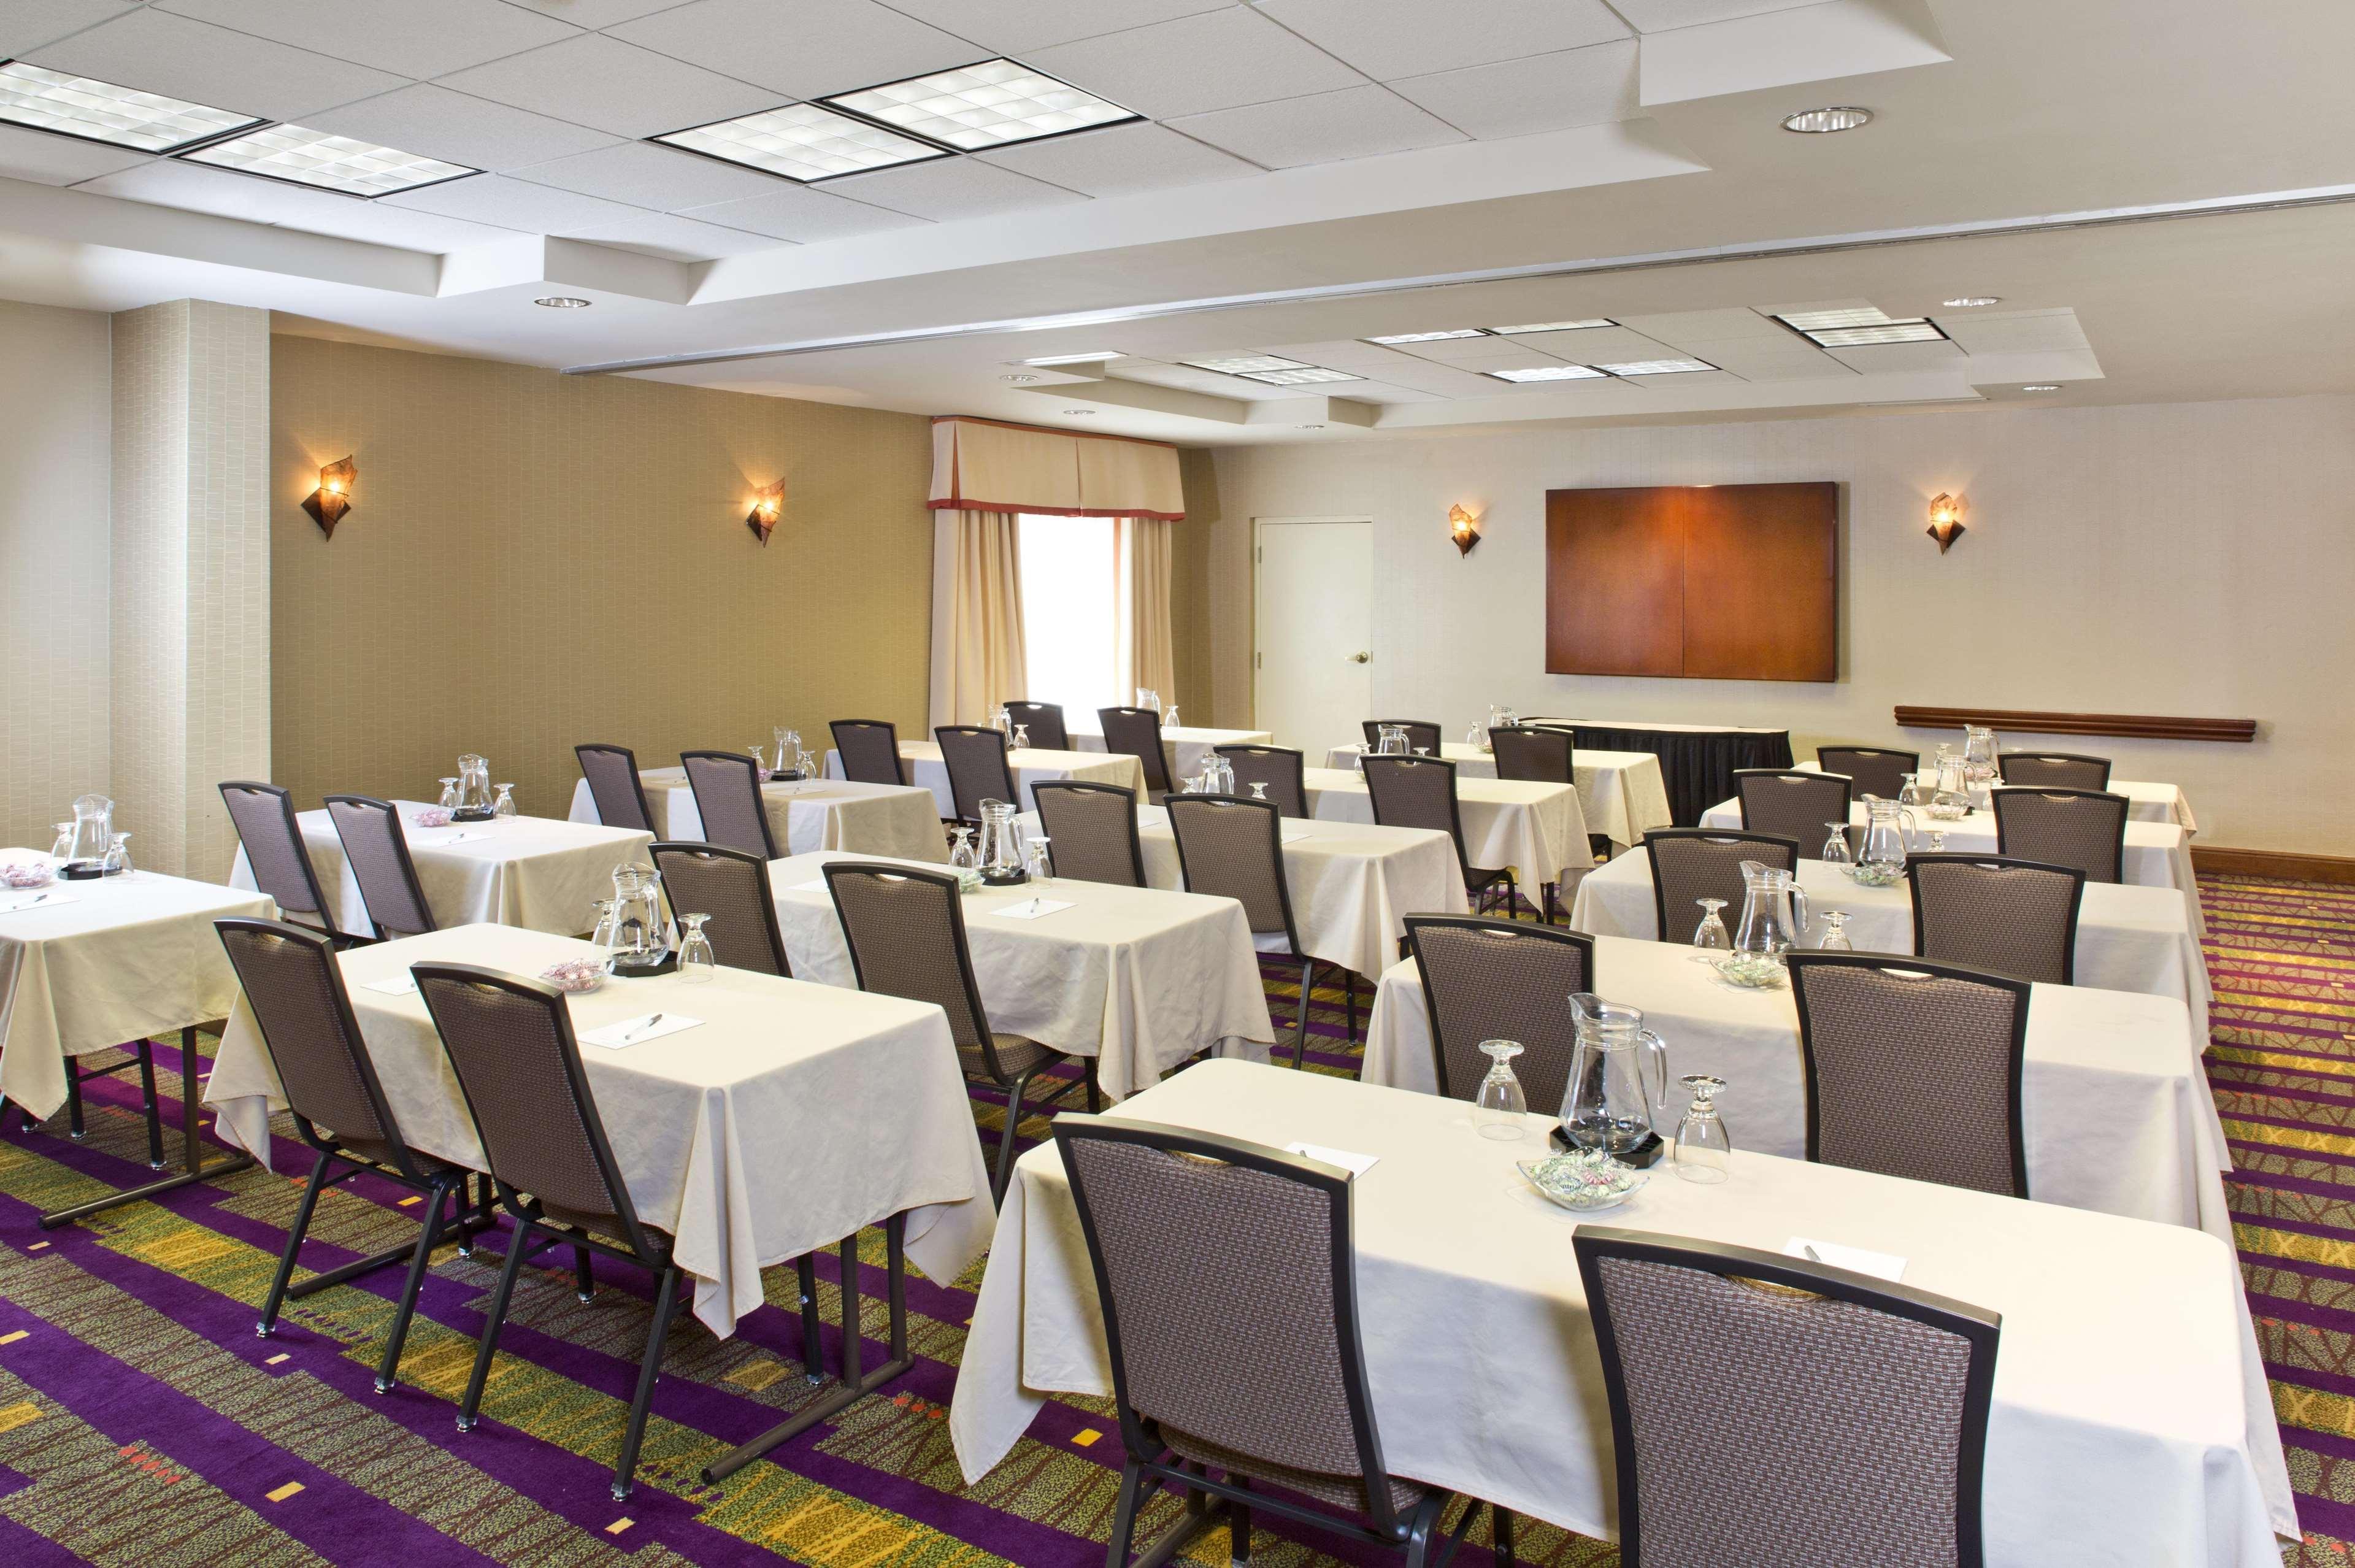 Hampton Inn & Suites Arundel Mills/Baltimore image 19